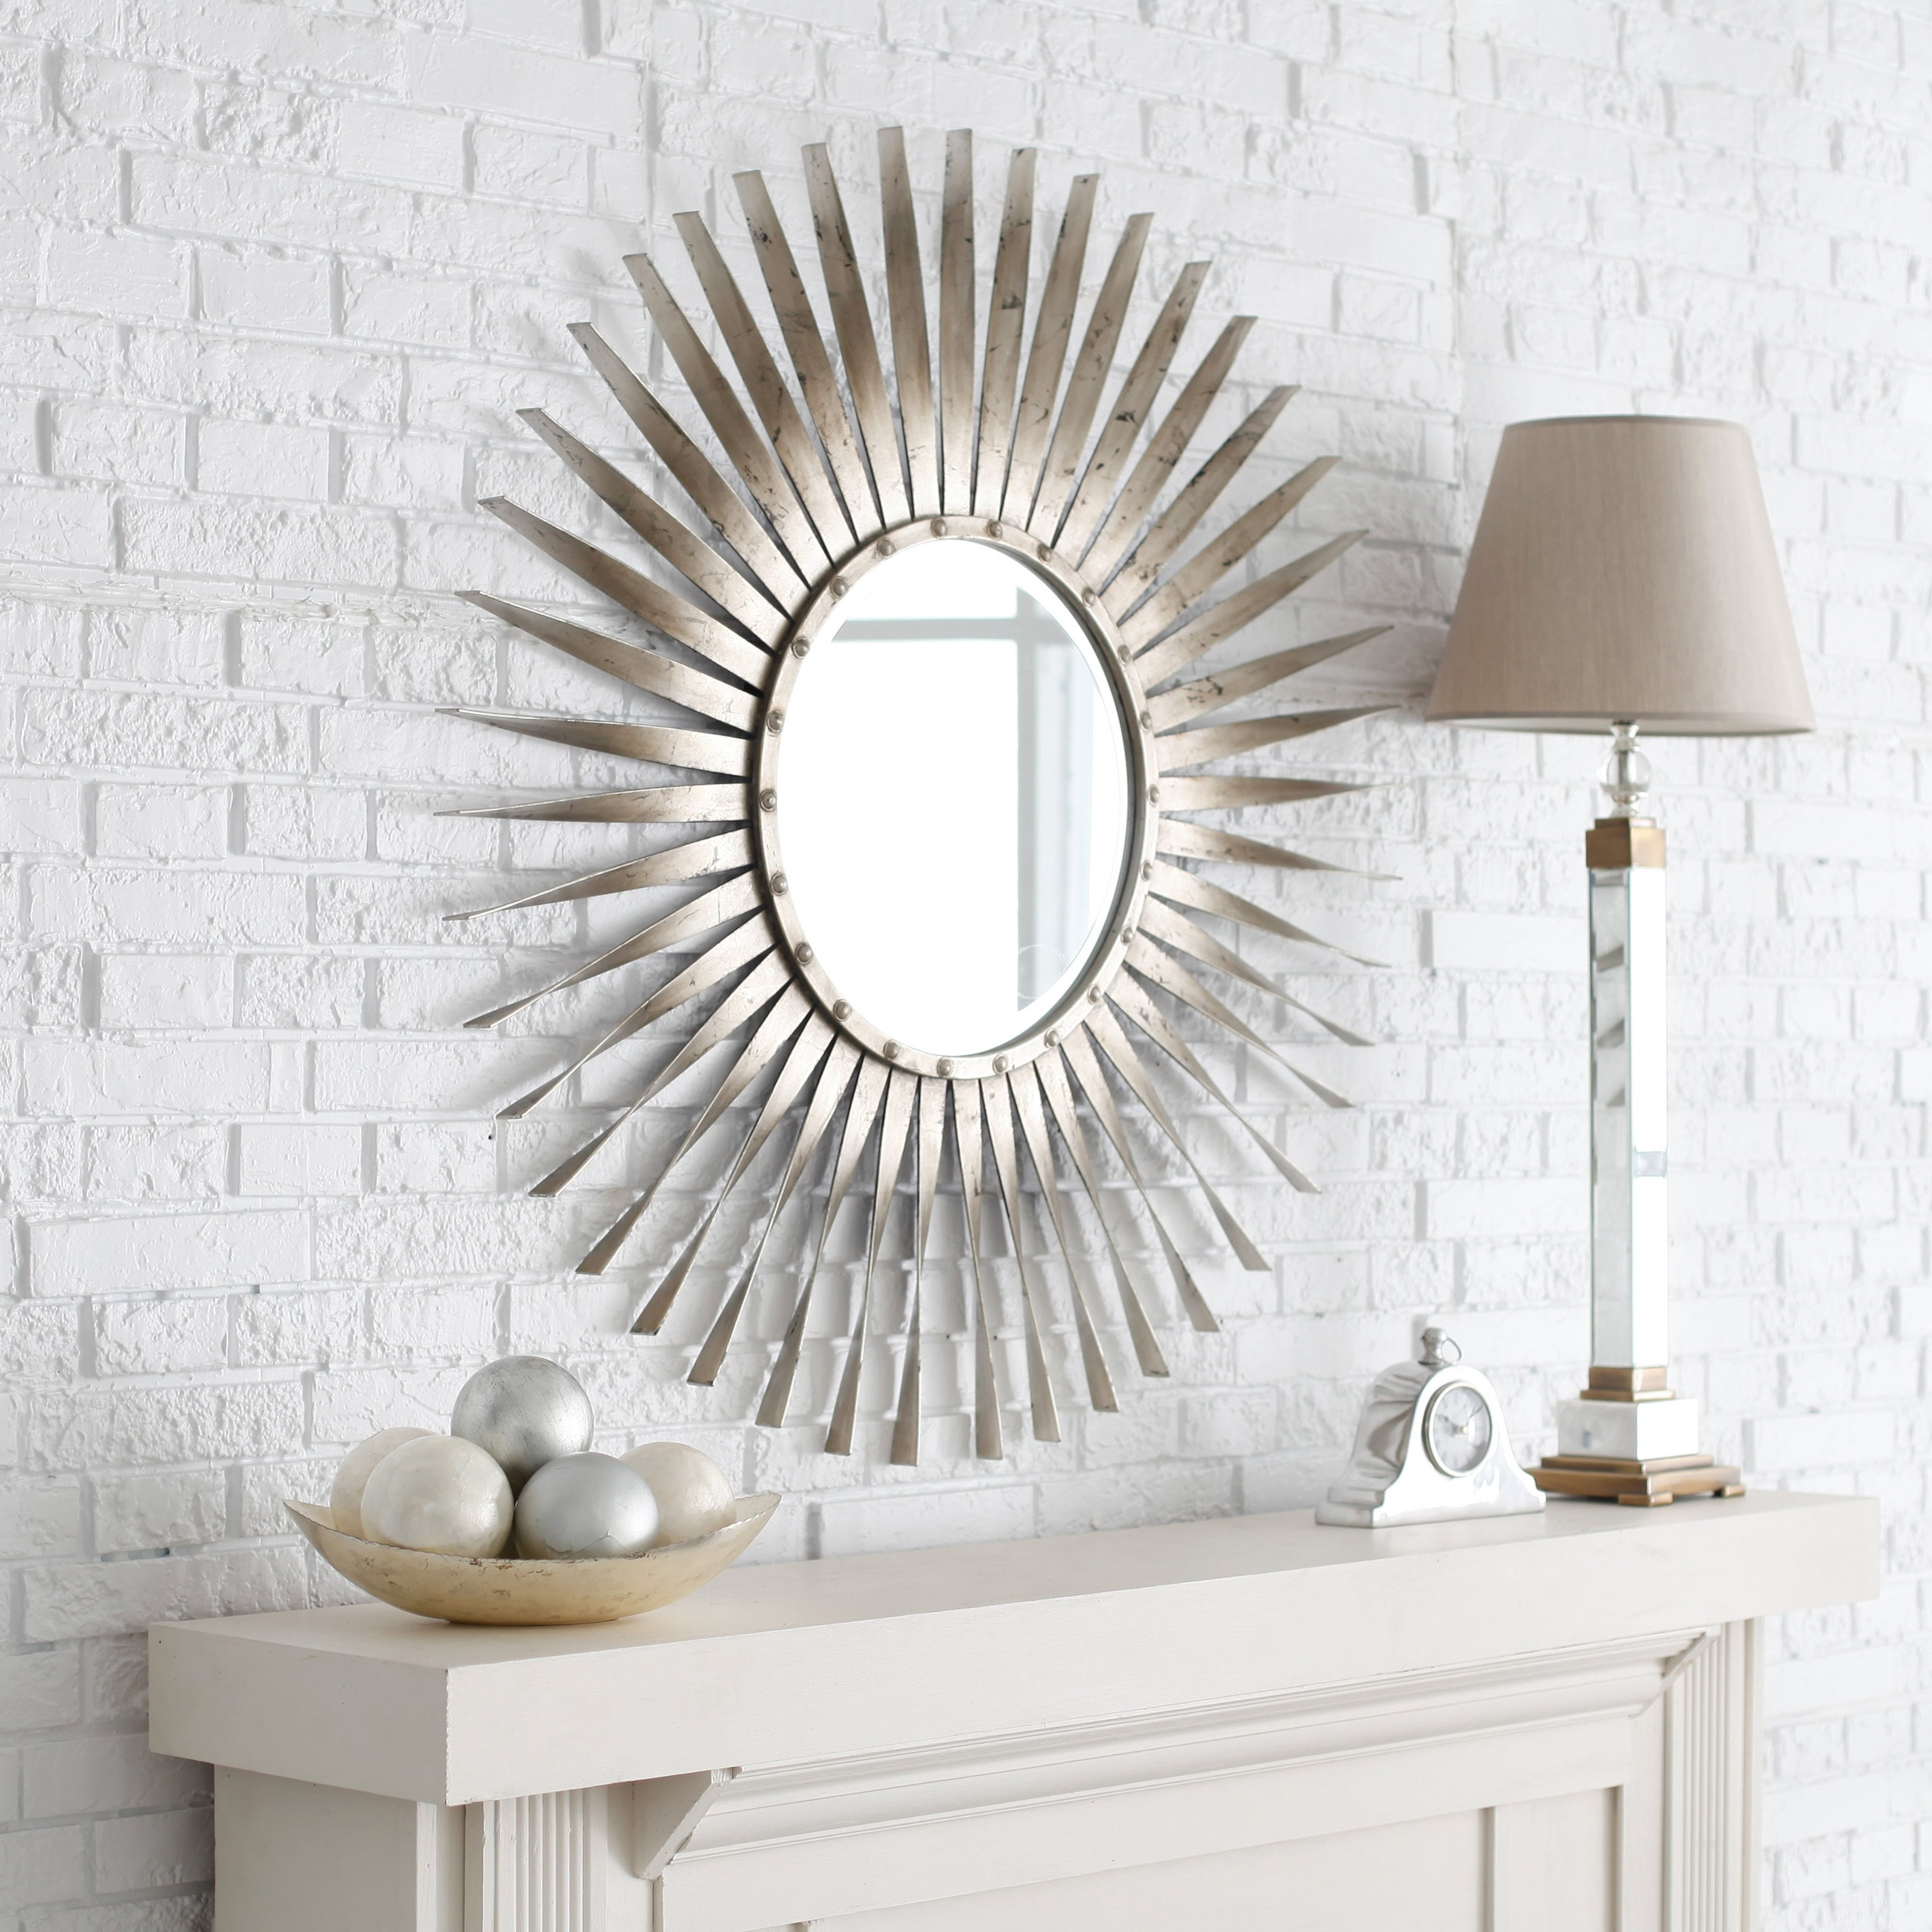 Round Stick On Wall Mirrors